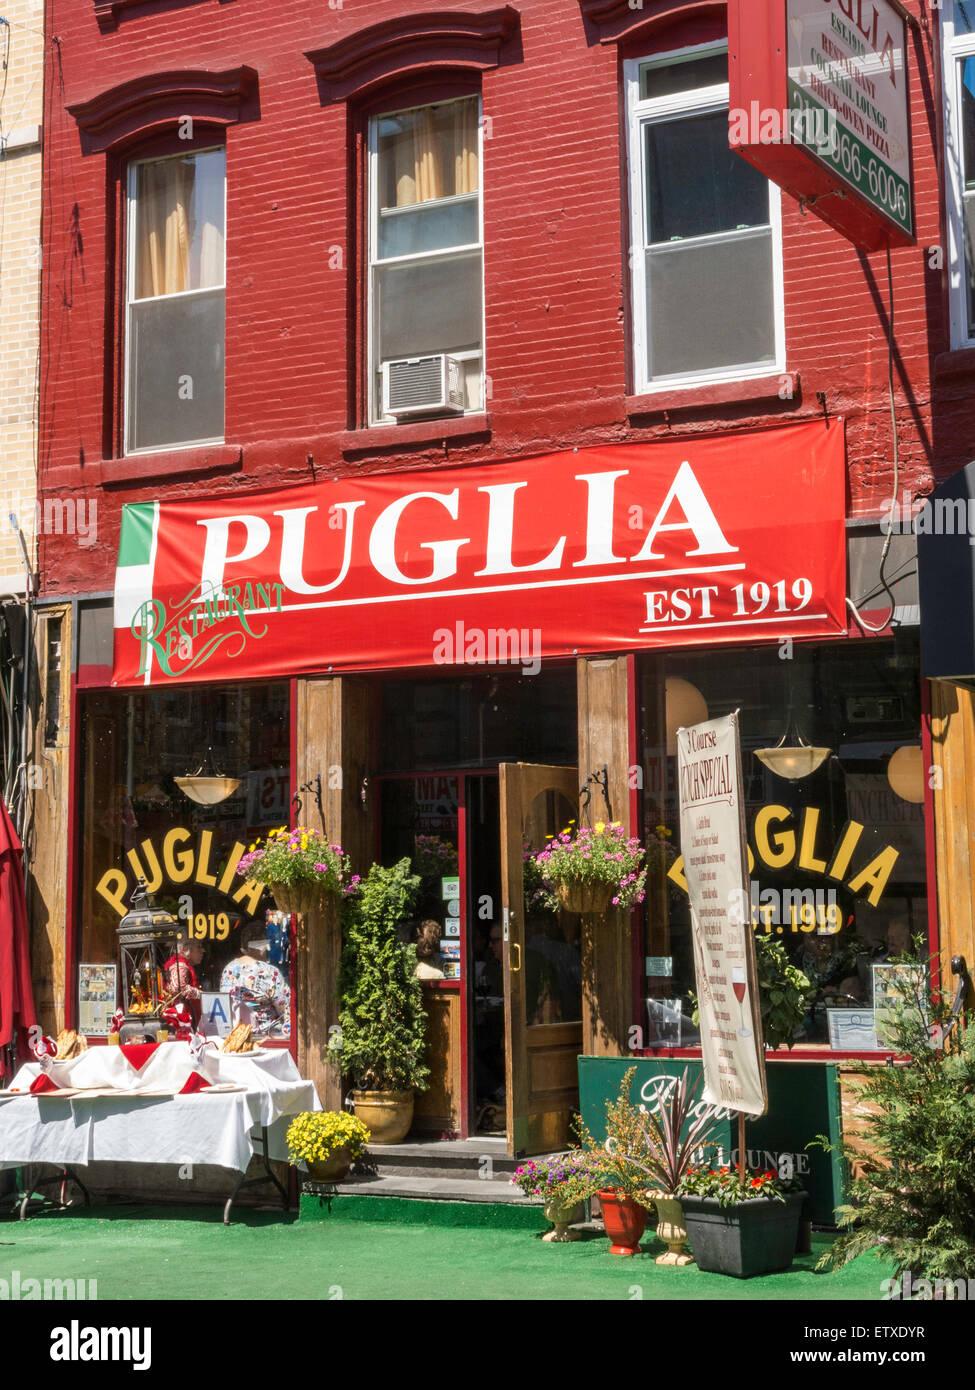 Puglia Restaurant In Little Italy Nyc Stock Photo Alamy